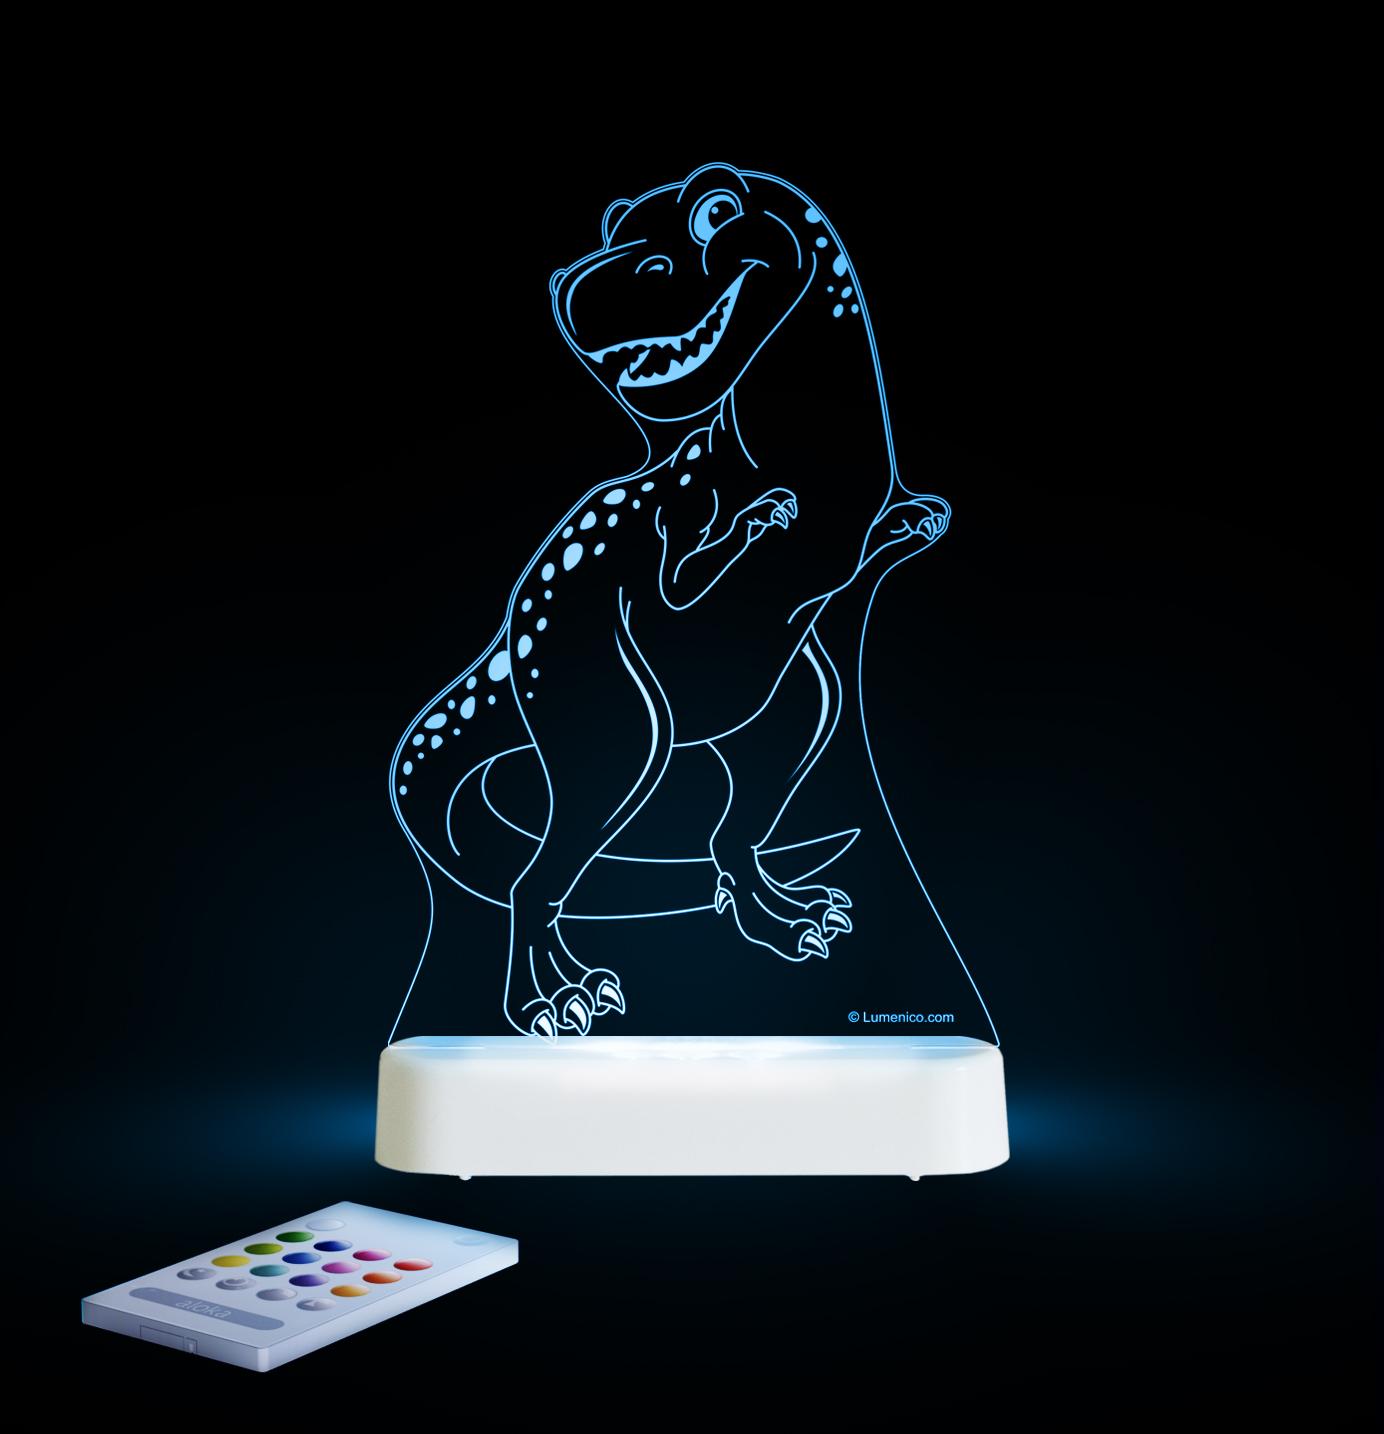 Aloka: Night Light - T-Rex image